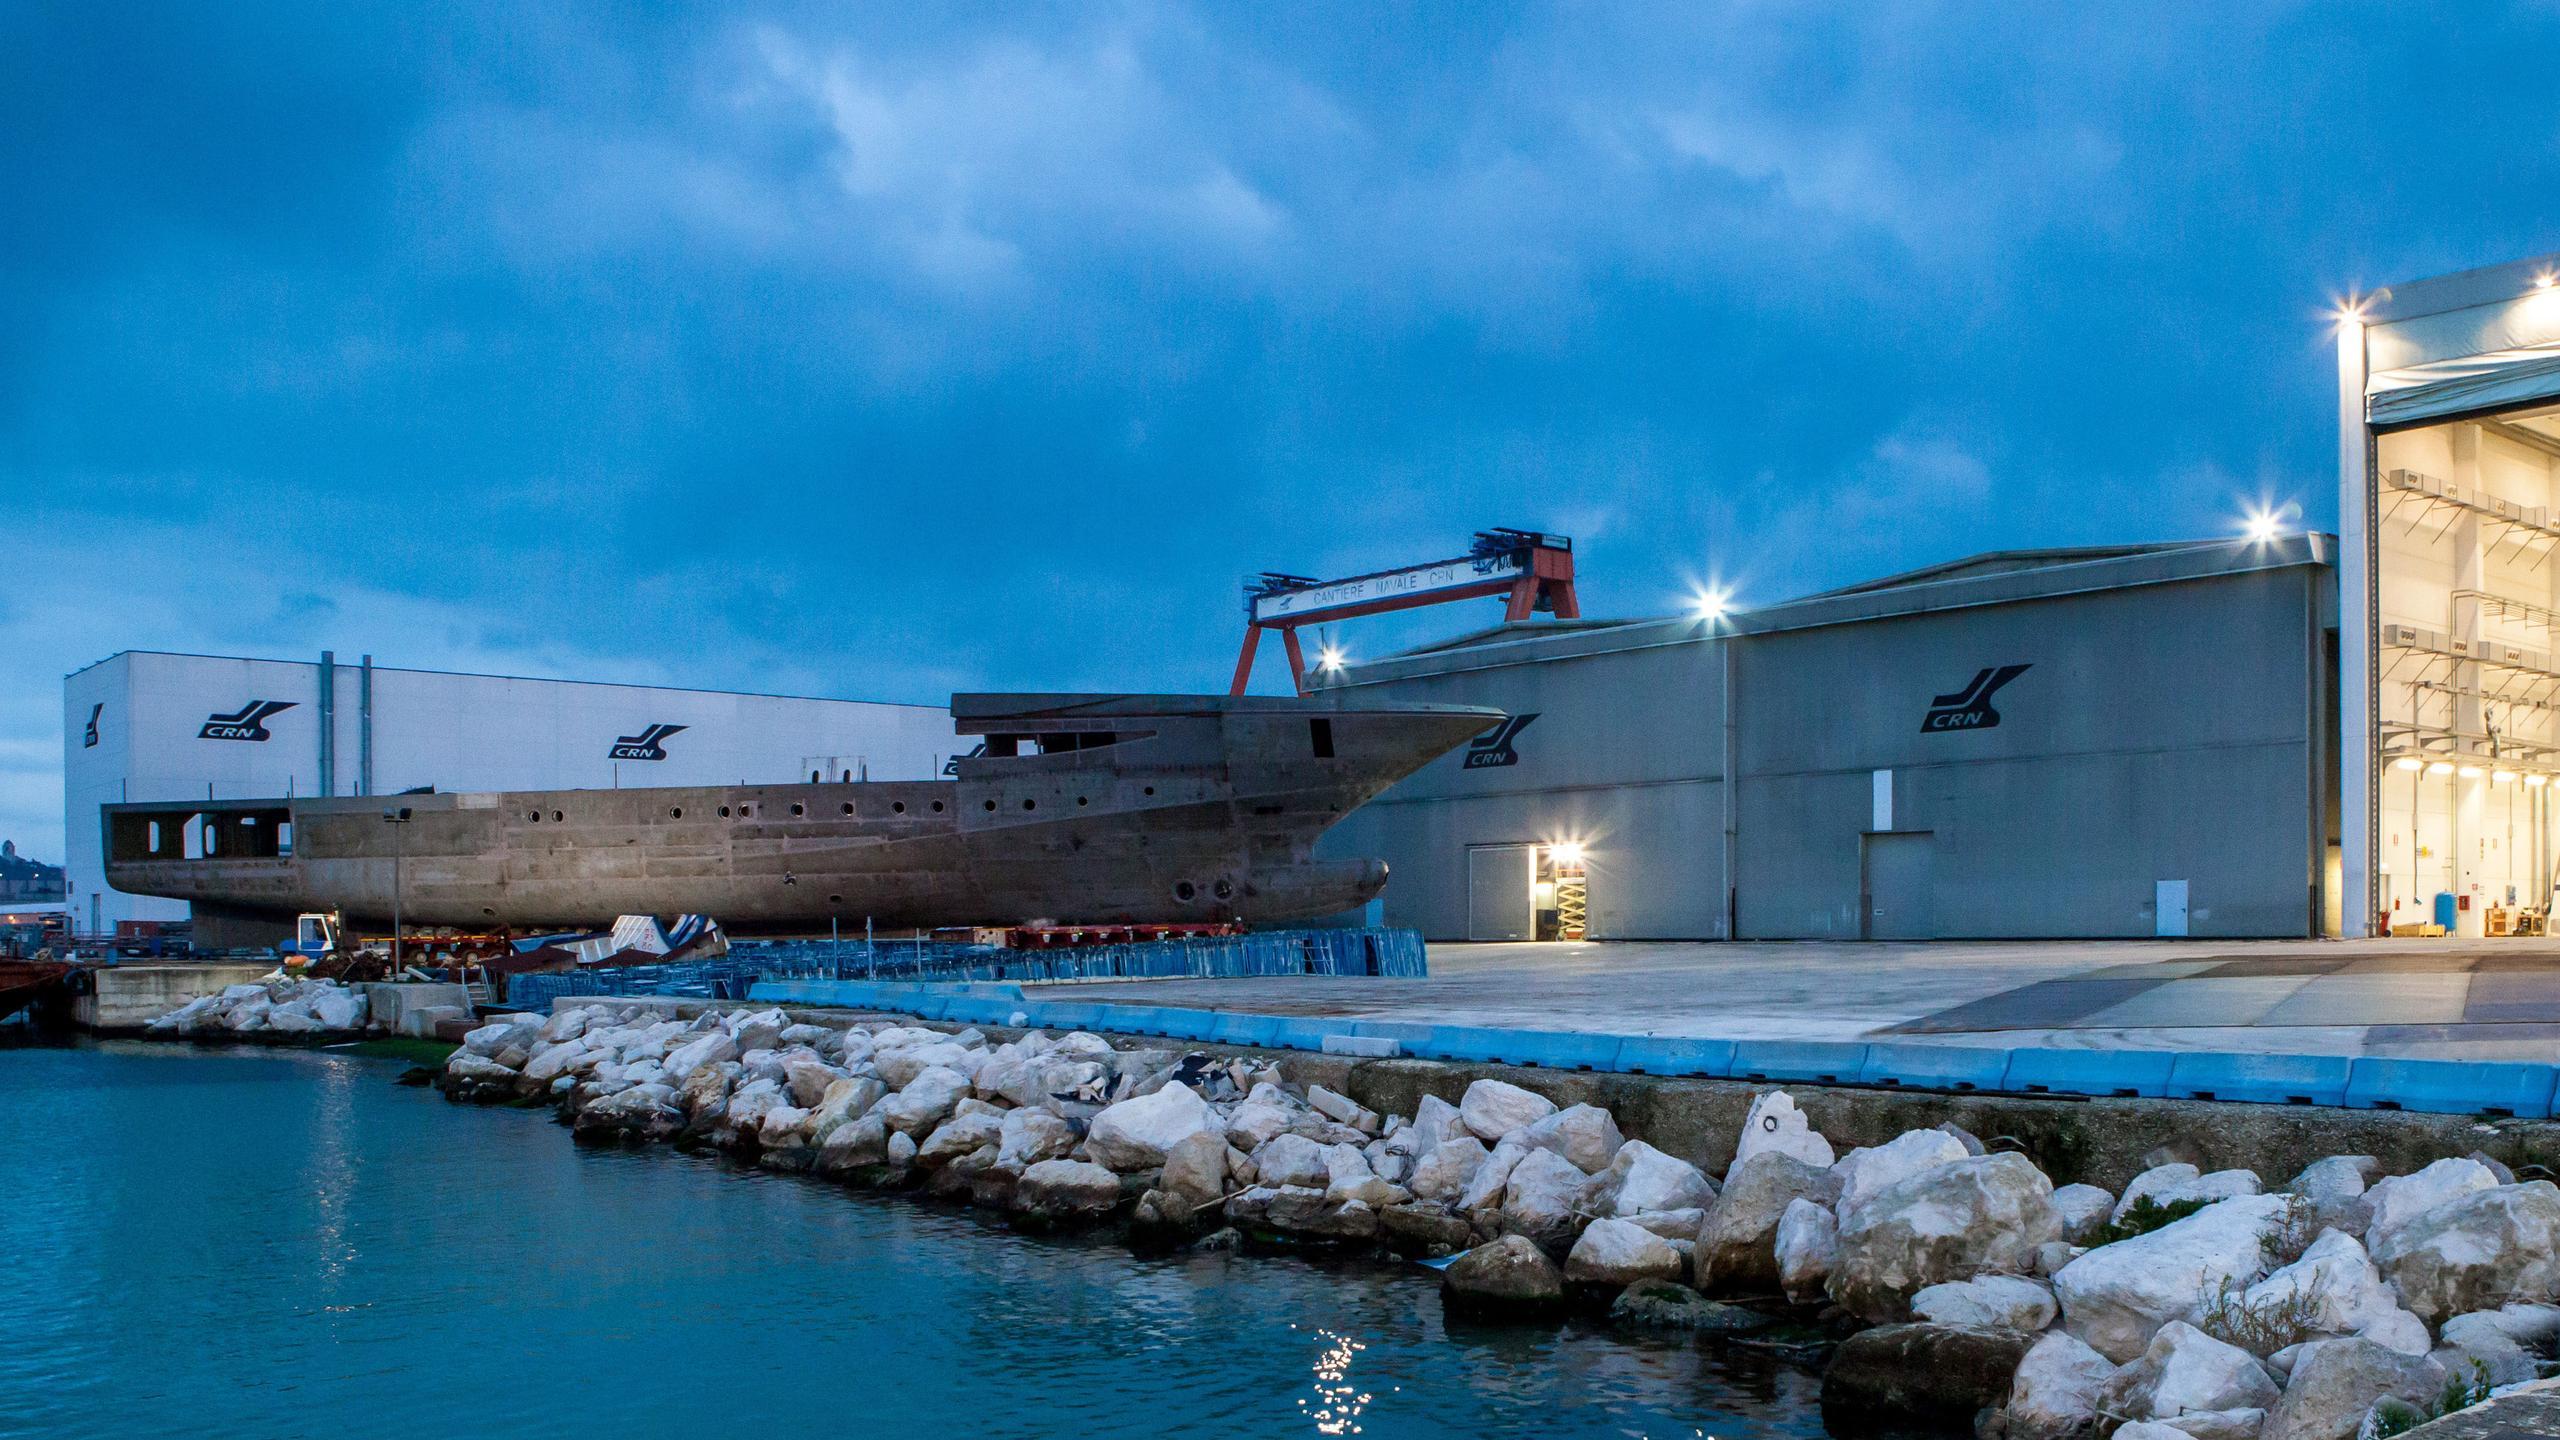 mimtee motoryacht crn yachts 135 80m 2019 hull